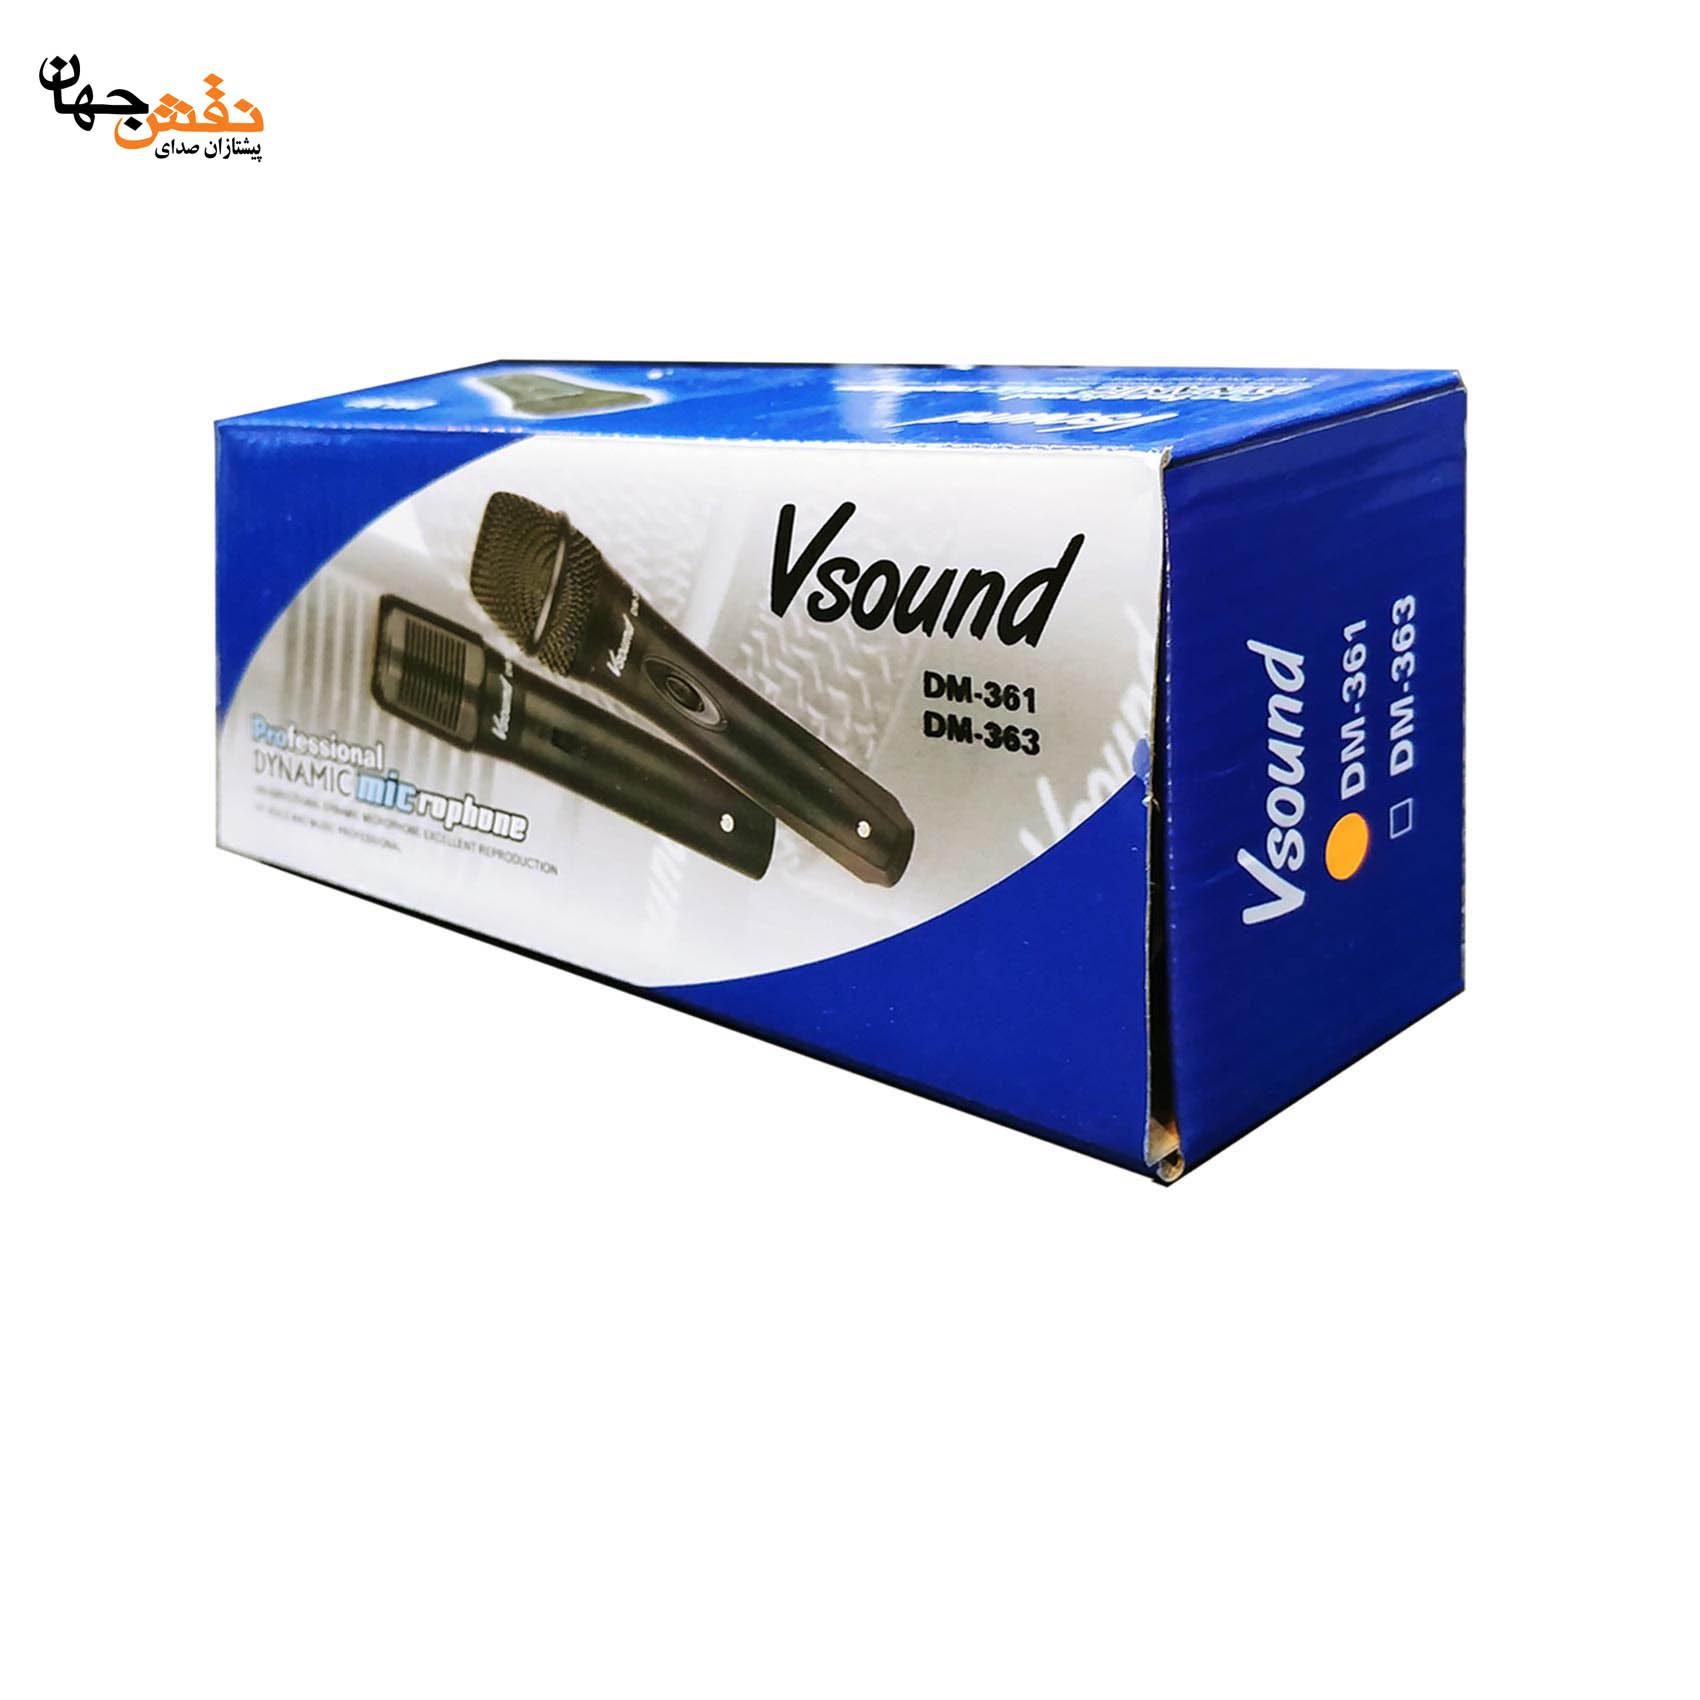 vsound-dm-361